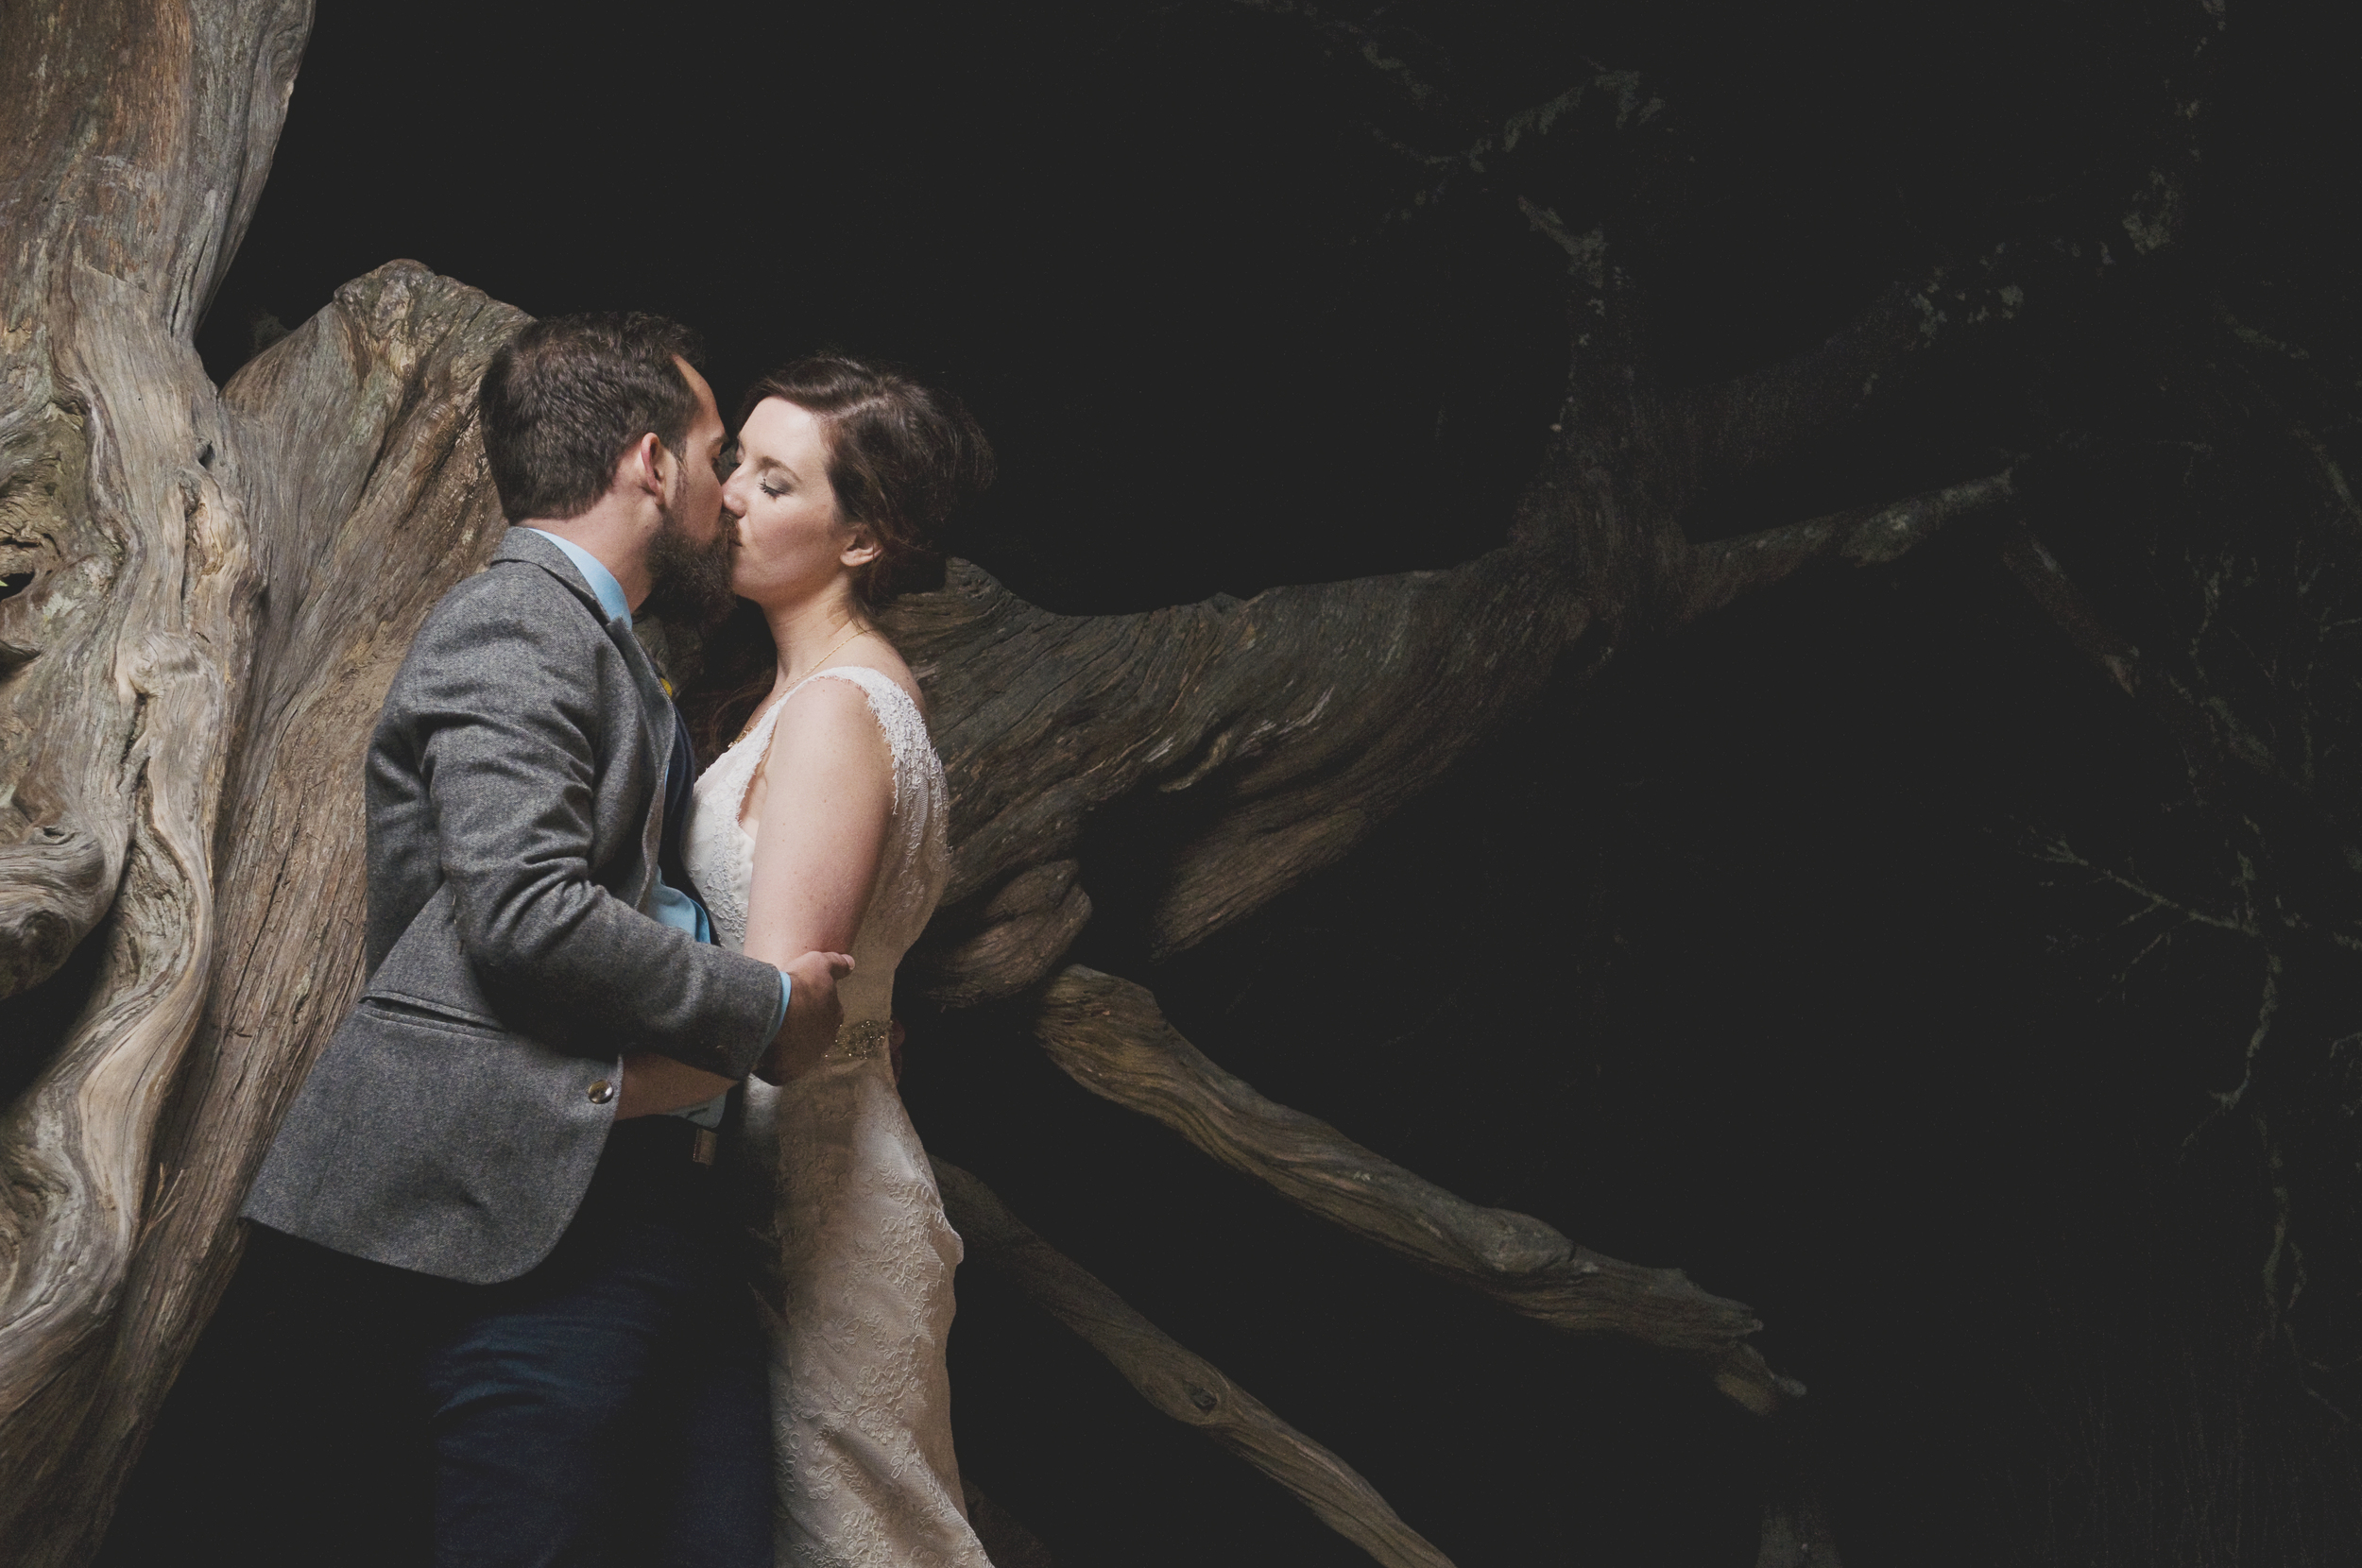 amber-and-david-ivory-and-beau-bridal-boutique-lytle-foto-savannah-wedding-dresses-savannah-wedding-planner-savannah-event-designer-savannah-weddings-wormsloe-wedding-cohens-retreat-wedding-indie-wedding-handmade-wedding-historic-34.jpg